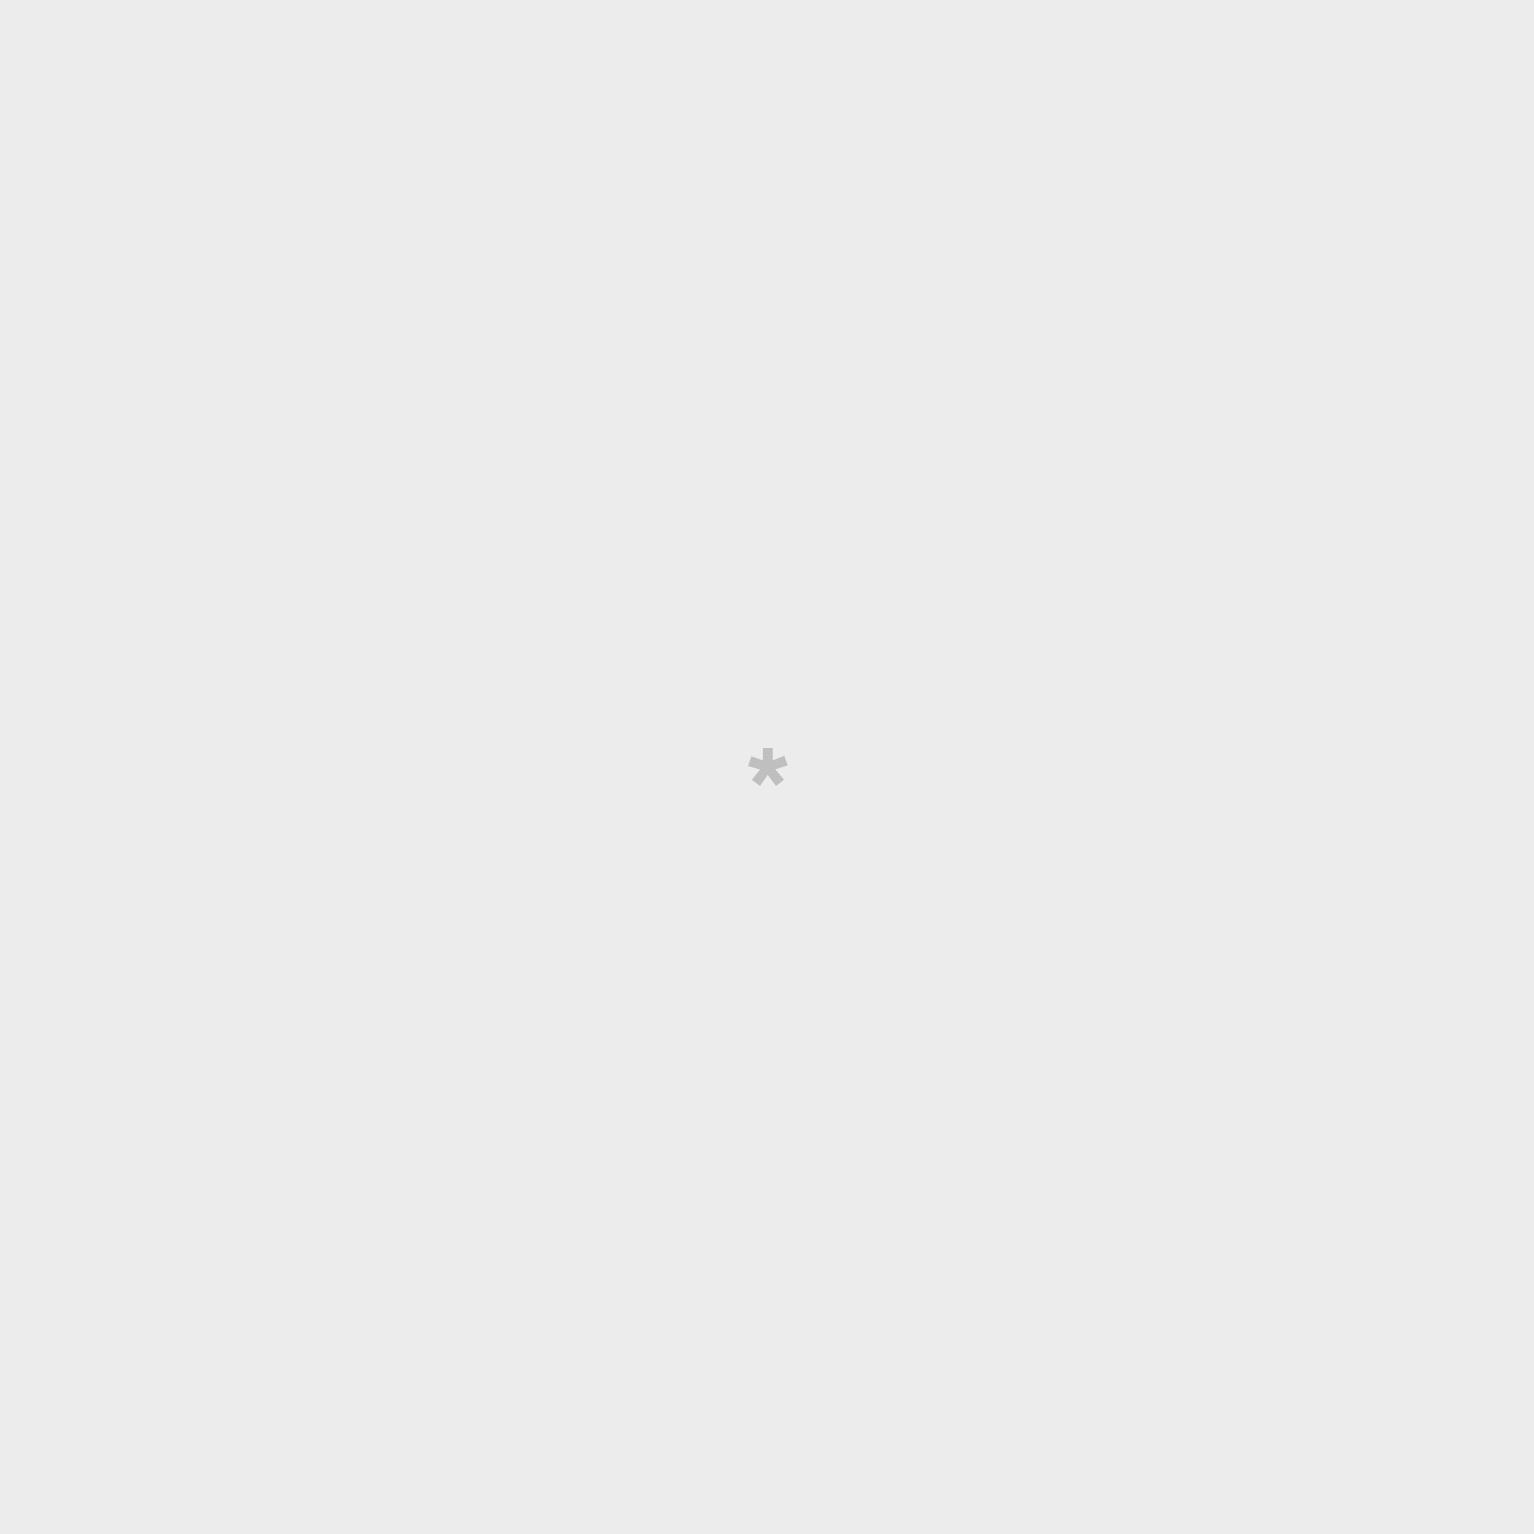 iPhone 12 mini unicorn phone case - I'm fantastic